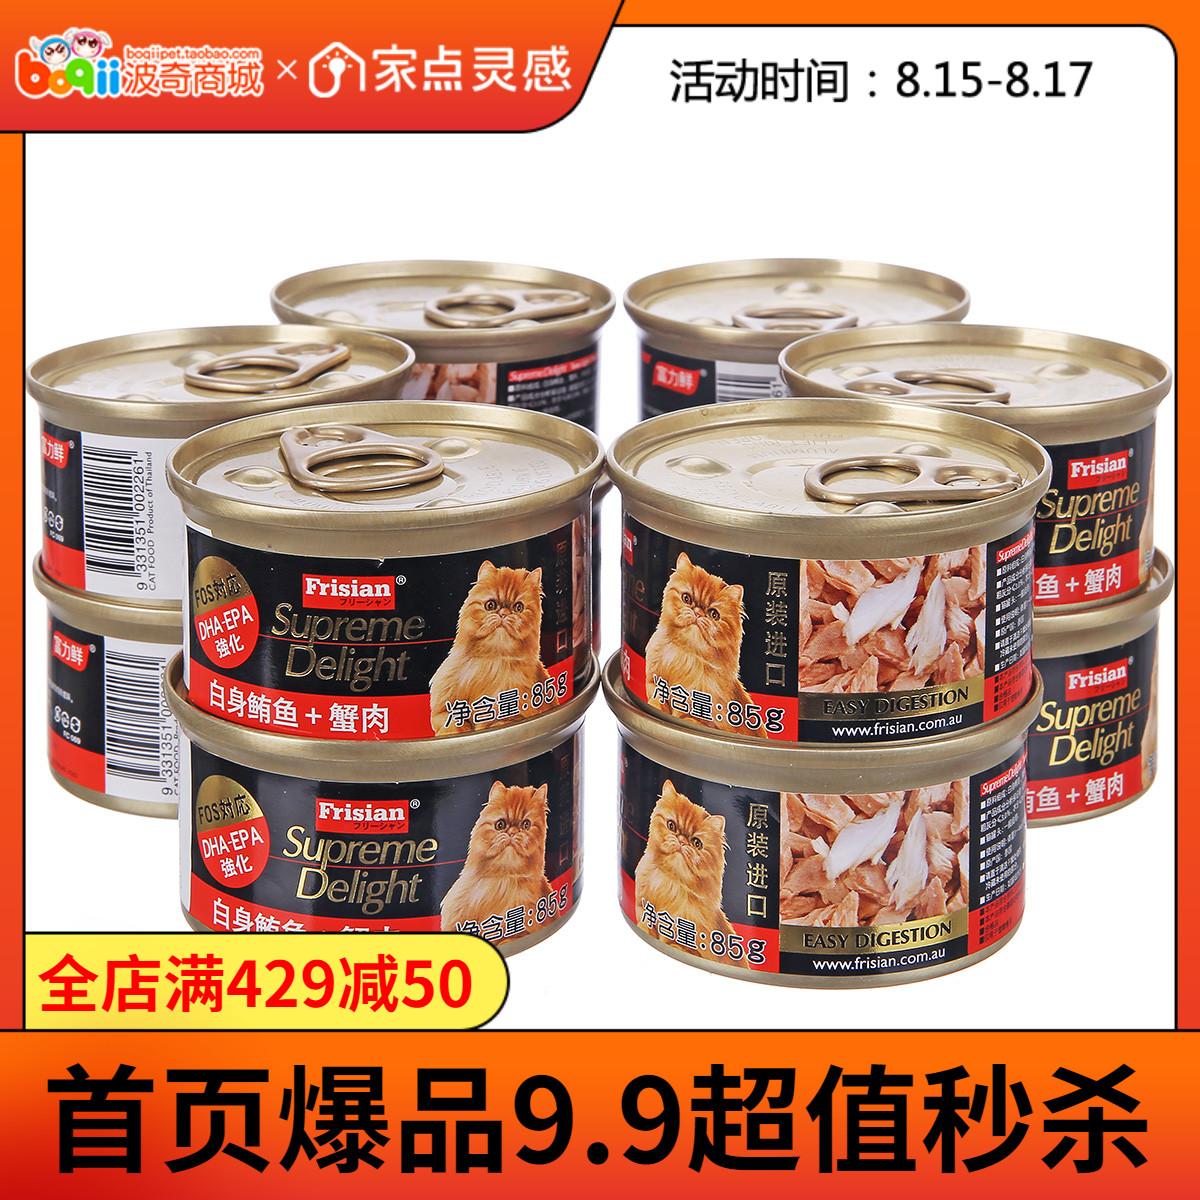 Консервированная еда для кошек Артикул 520417494968